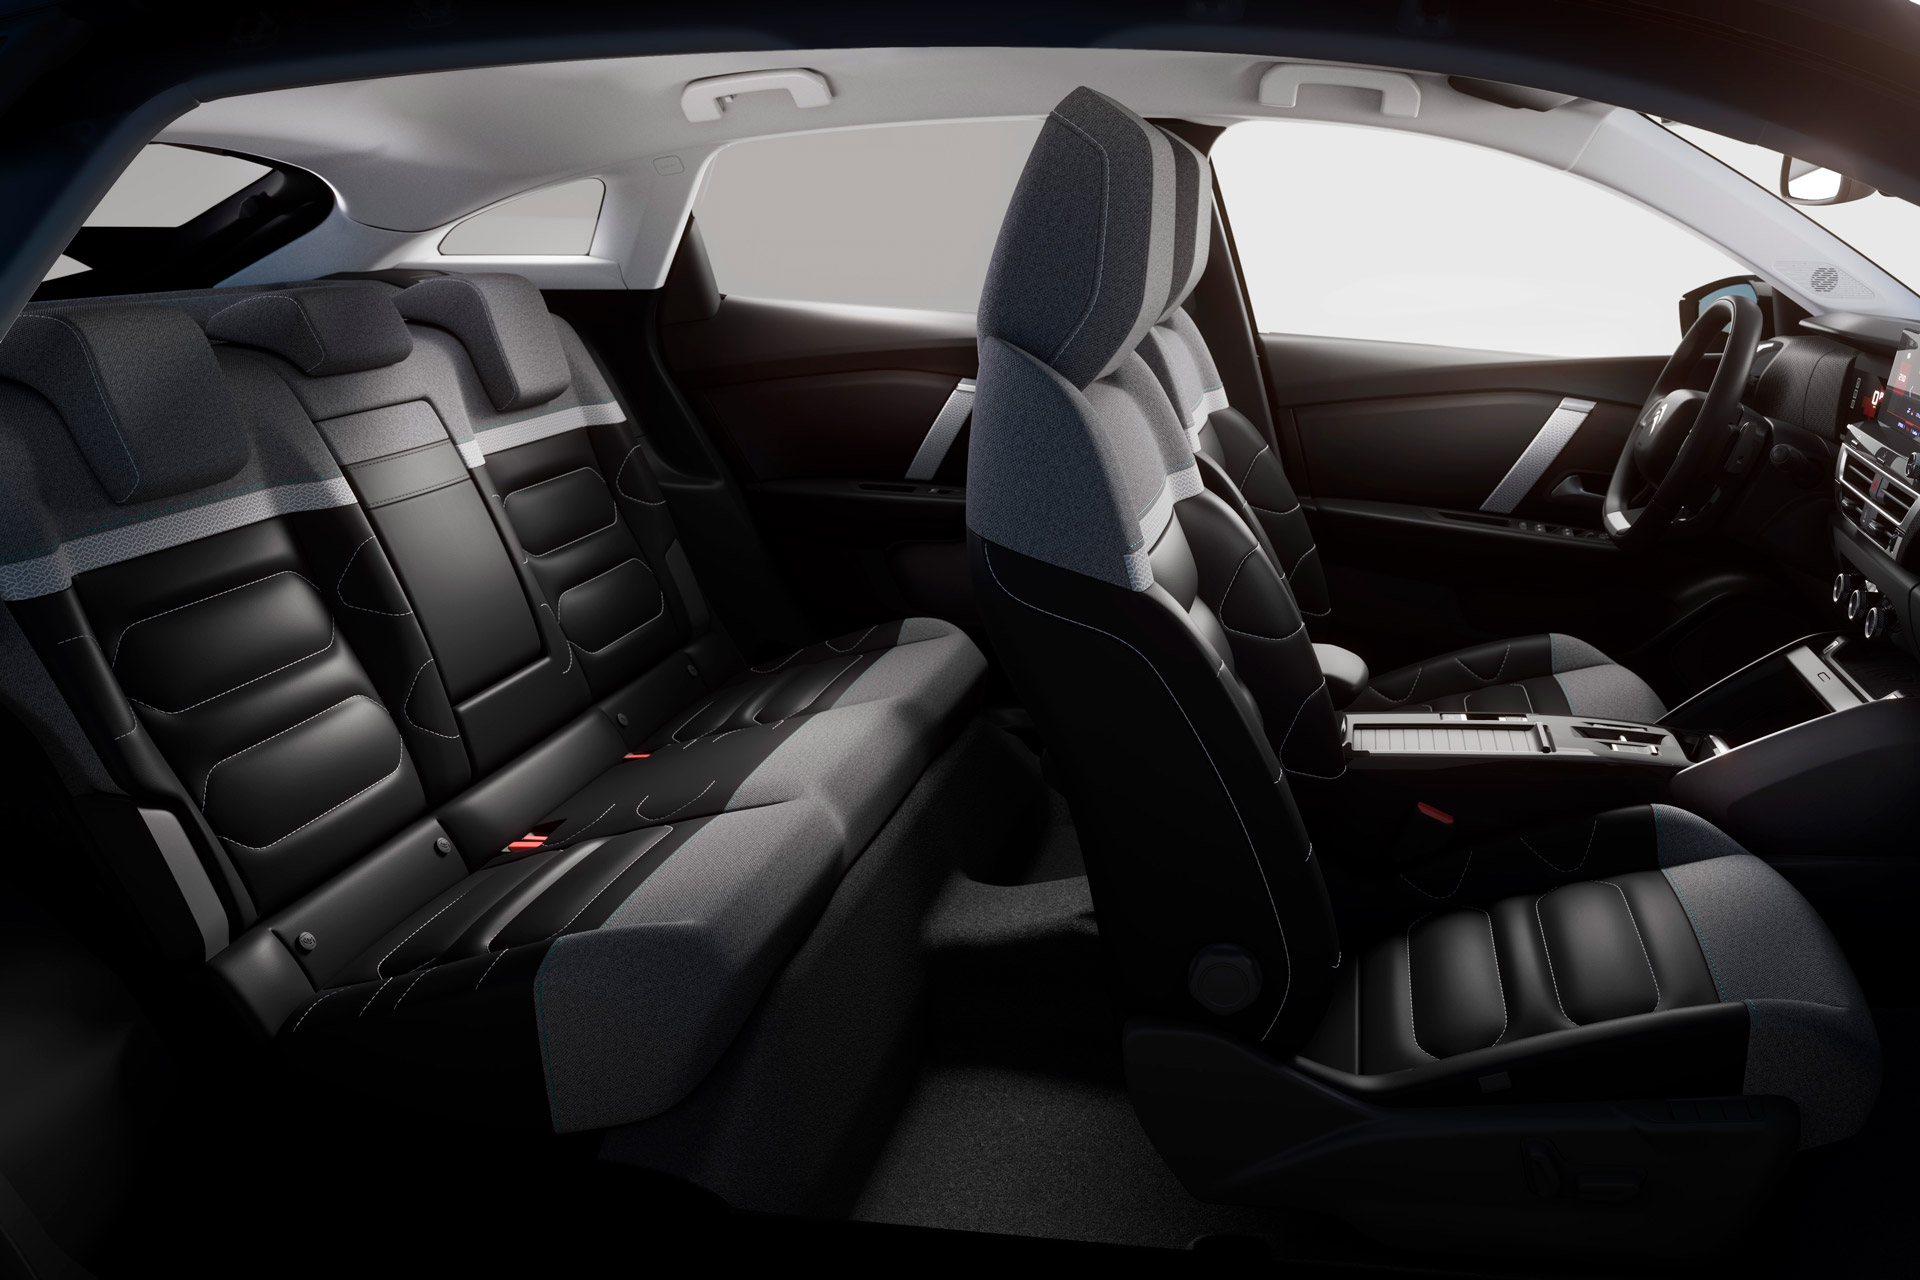 Citroën C4 interiør sæder